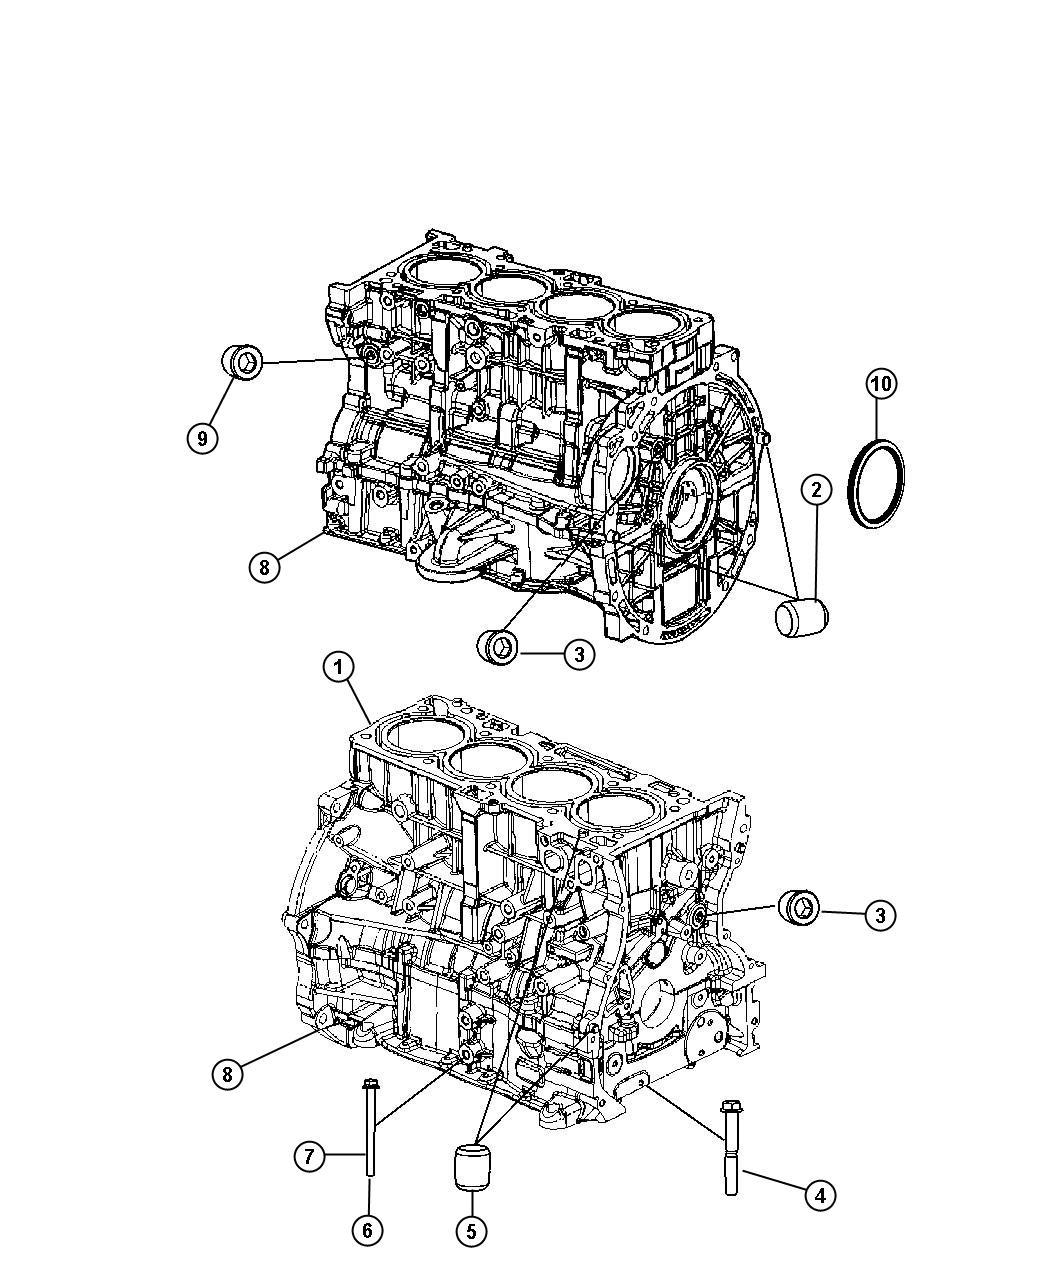 Dodge Avenger Engine Short Block With Nha Engine Oil